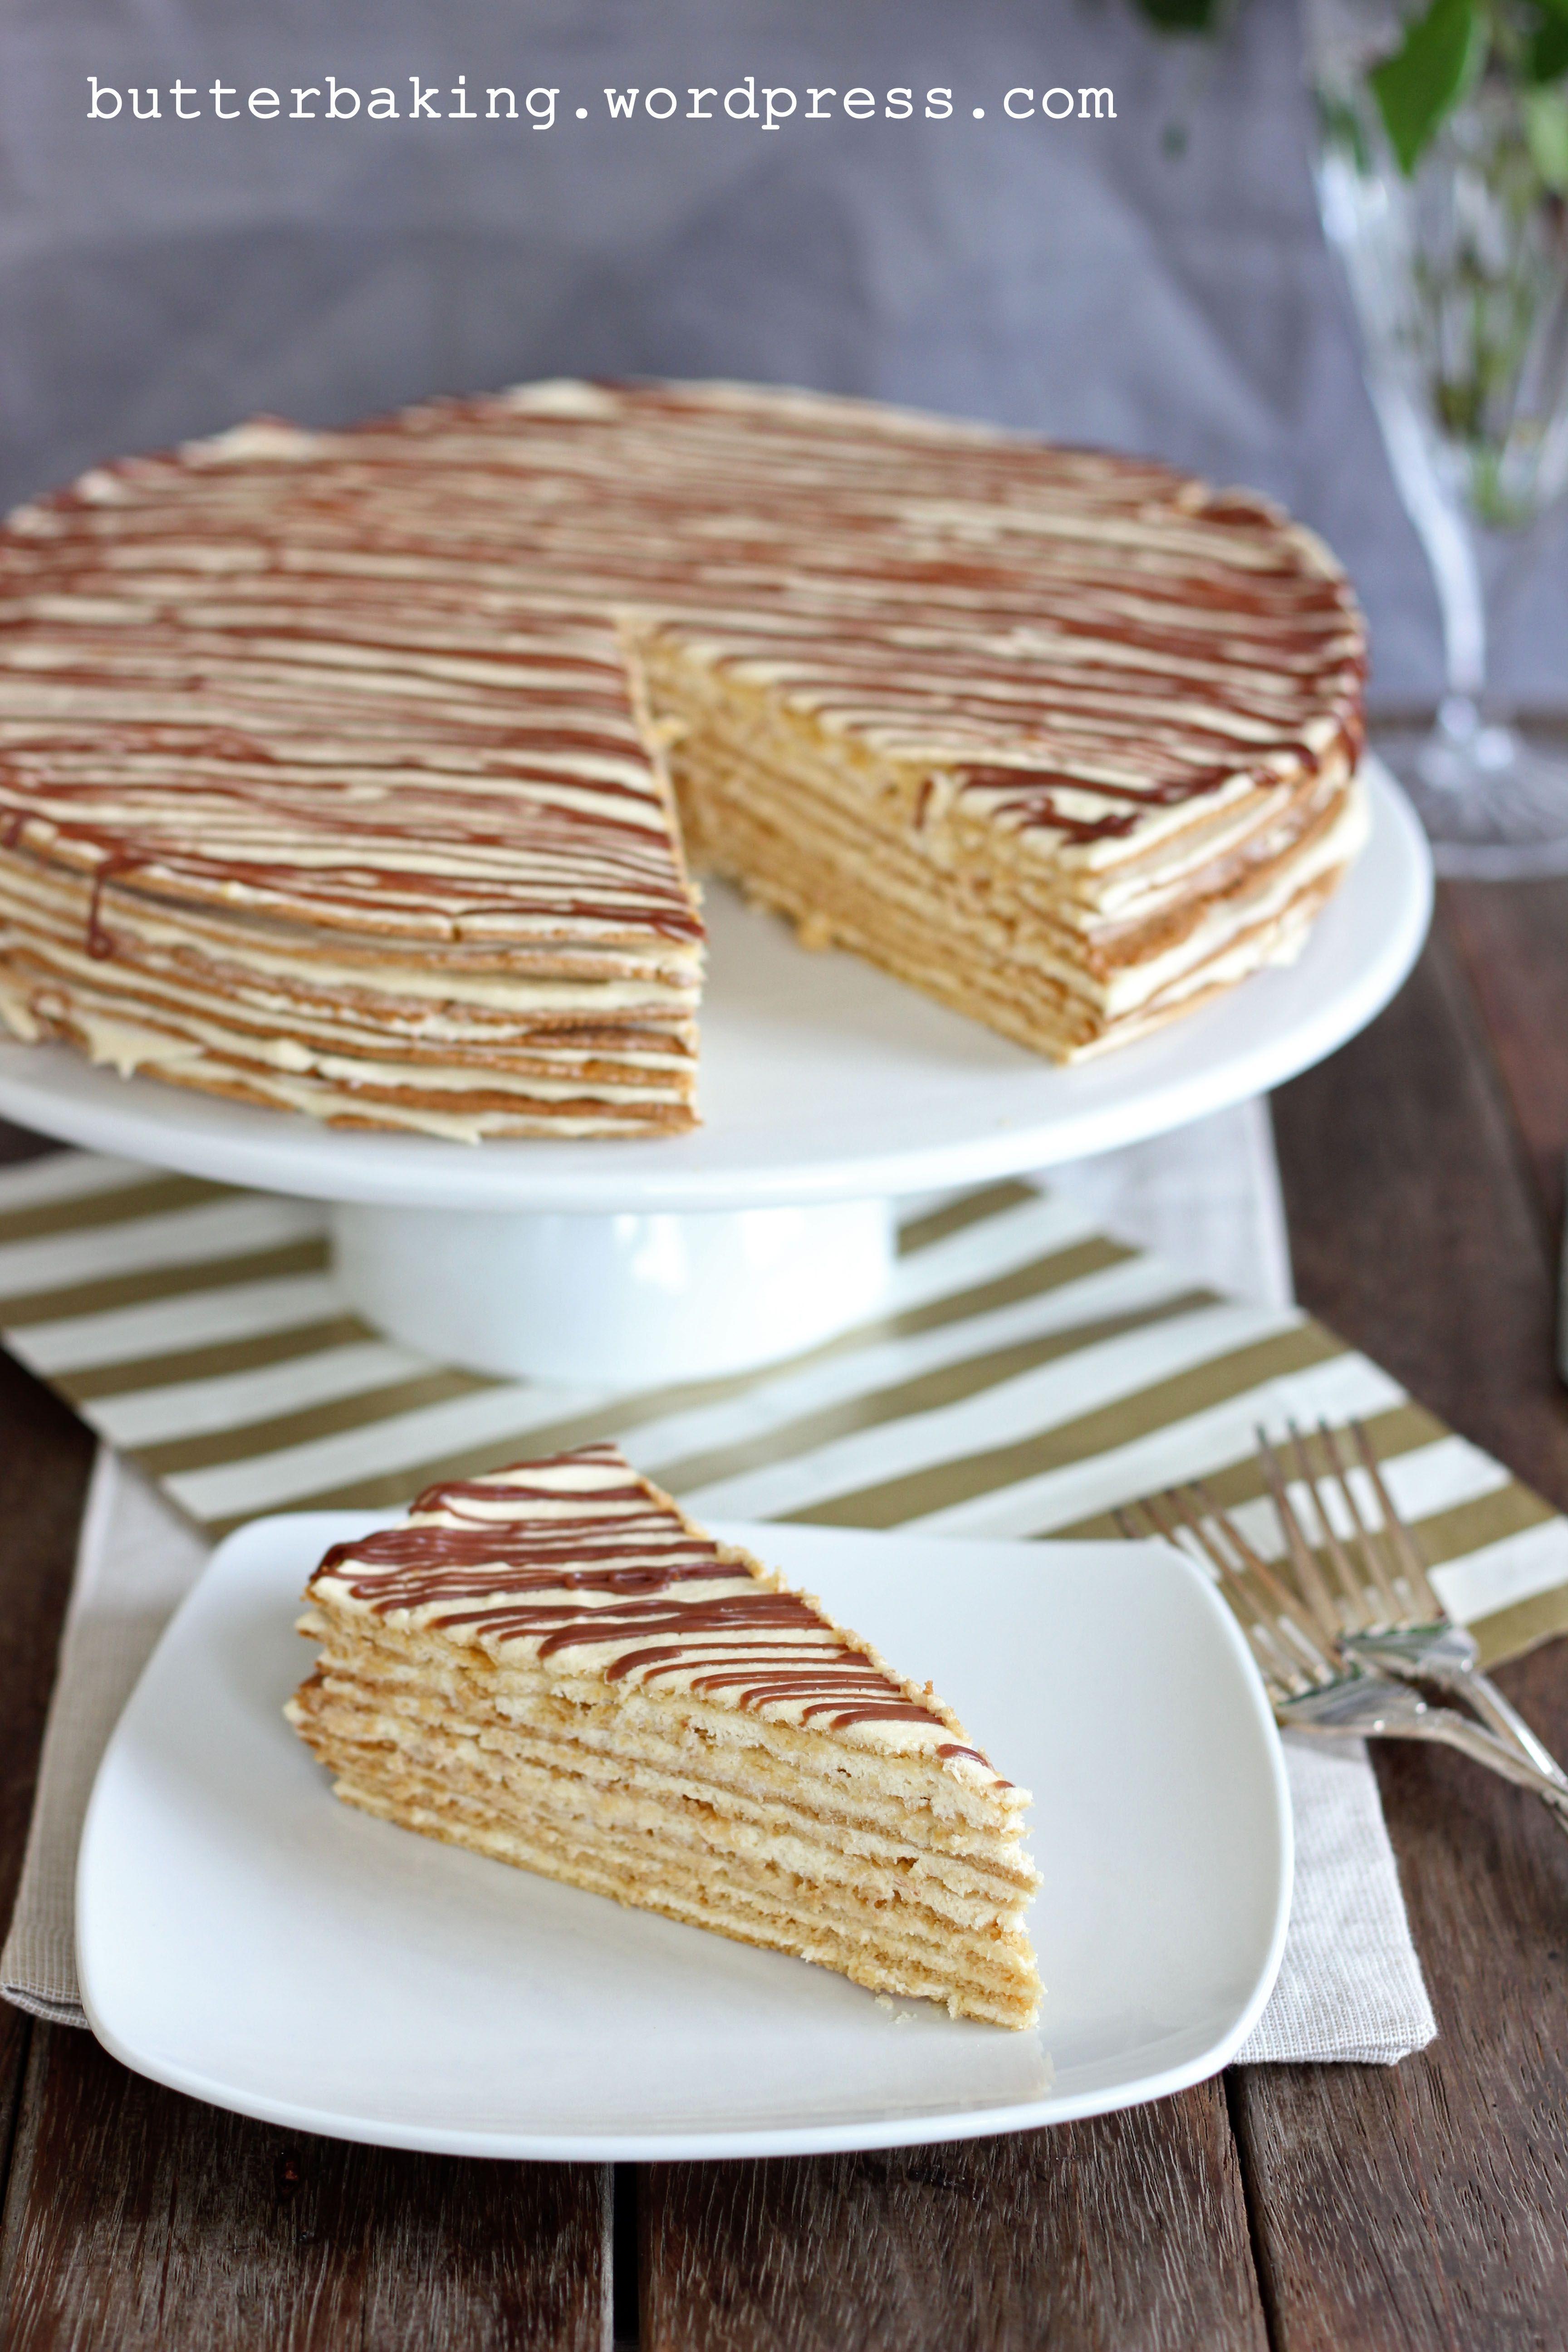 Polish icebox cake miodowiec recipe cake polish icebox cake miodowiec polish food recipespolish dessertsicebox forumfinder Images